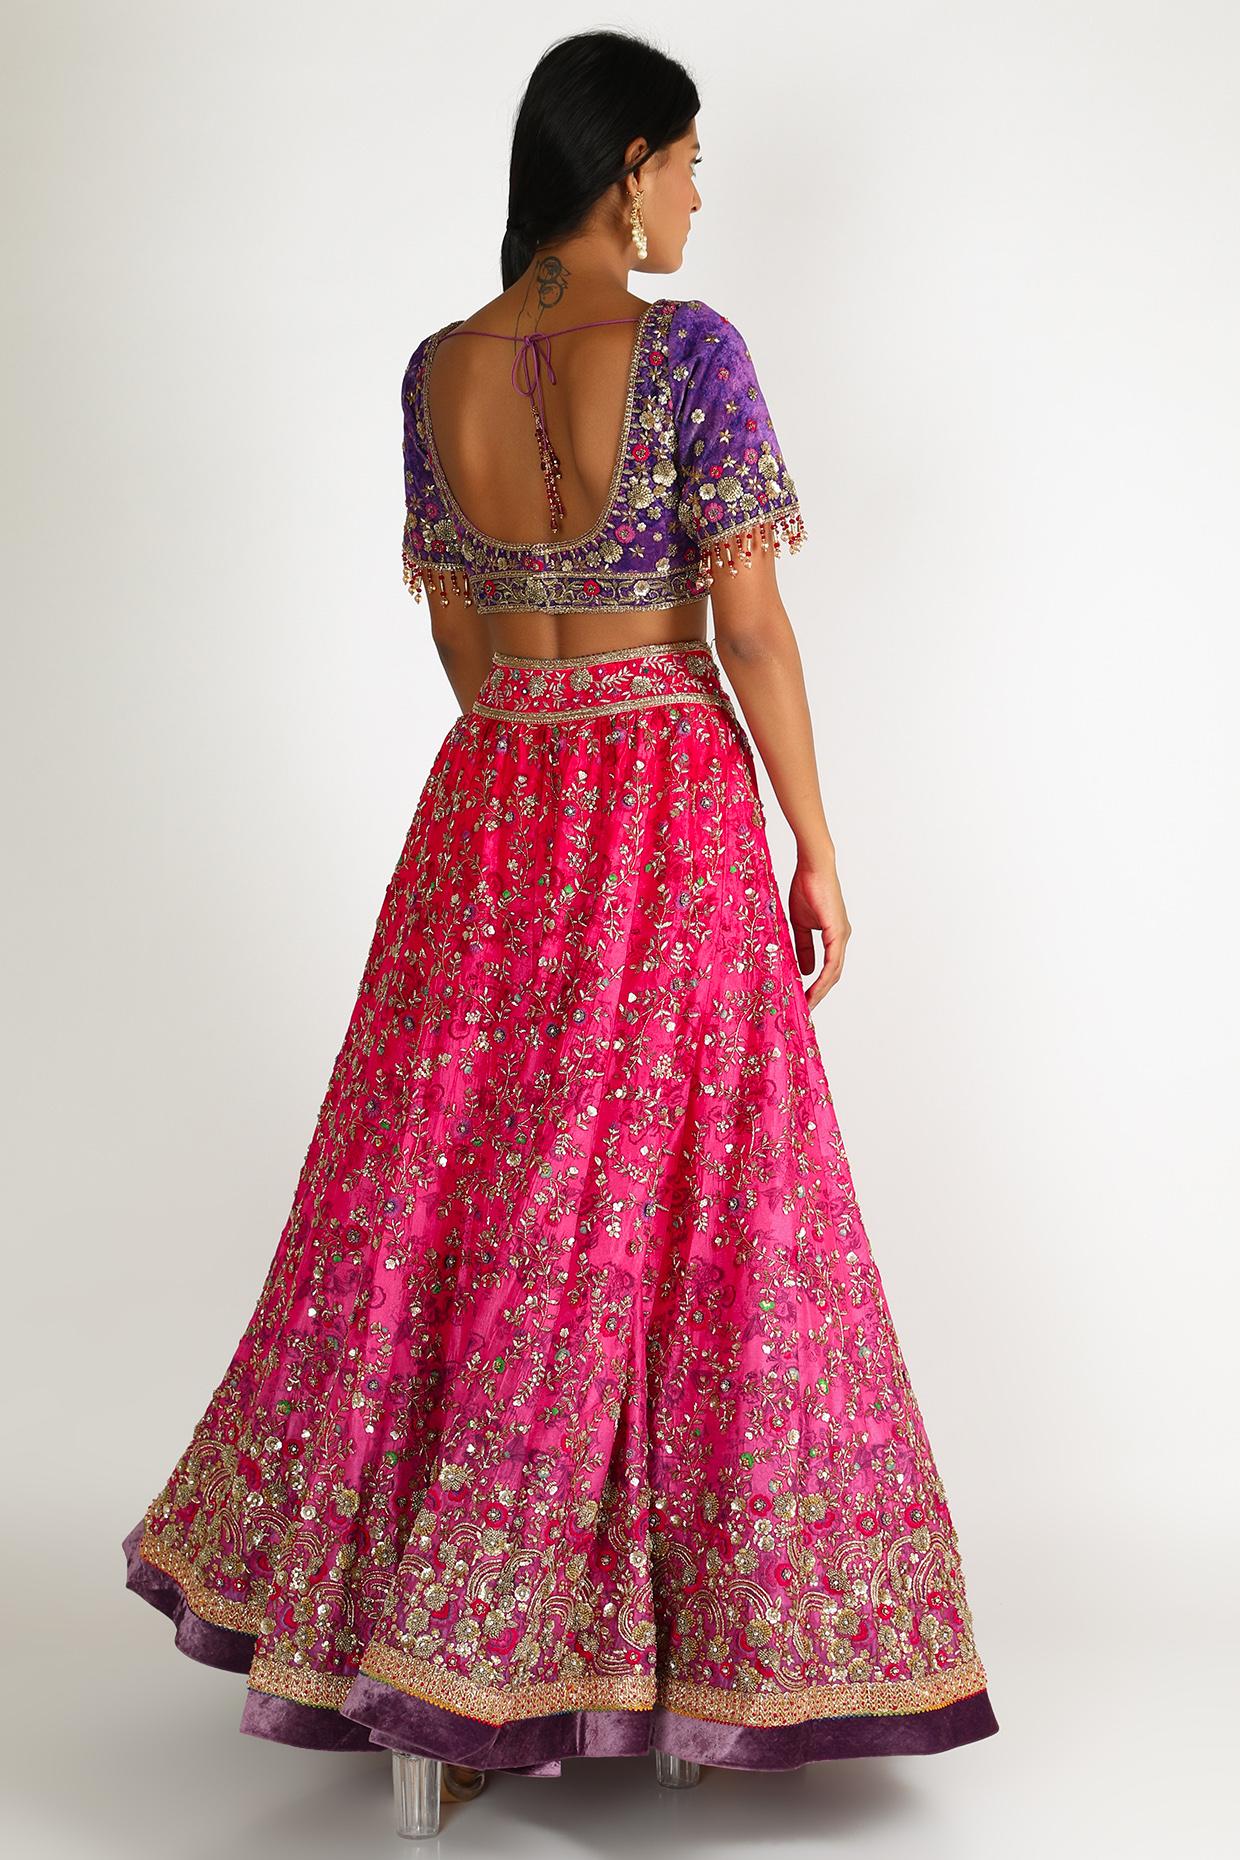 Pink & Purple Embroidered Lehenga Set by Tarun Tahiliani